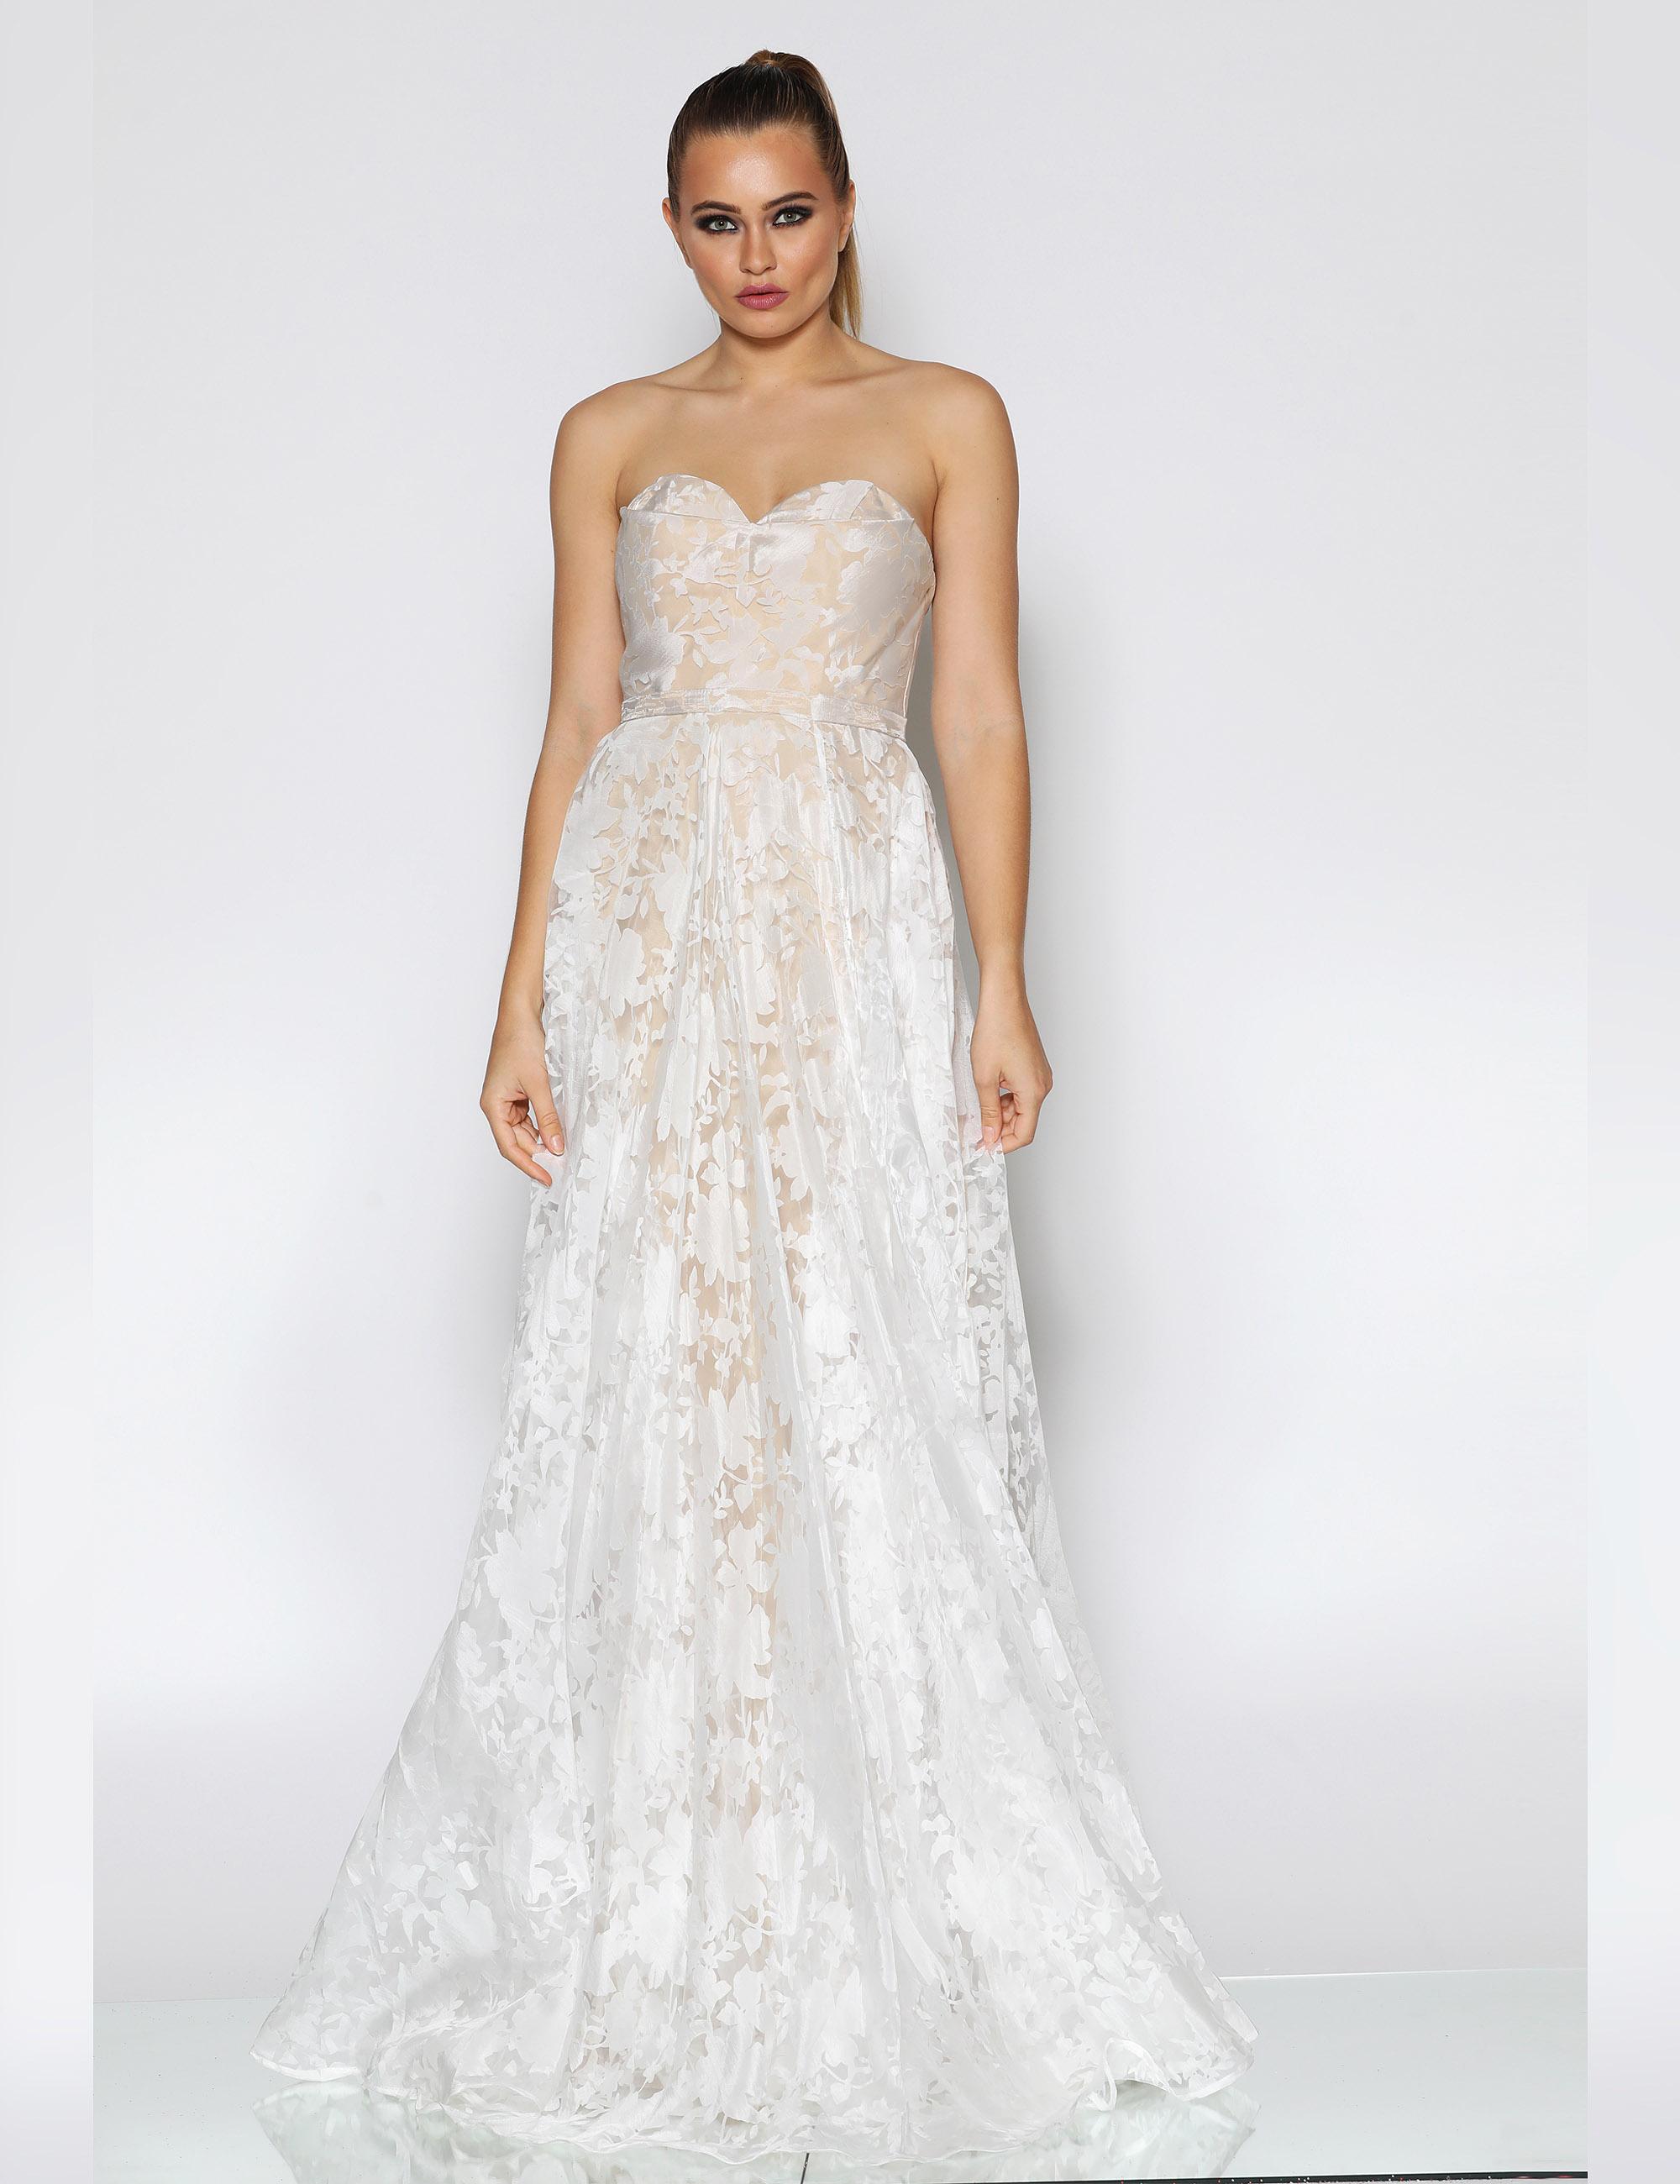 Jadore J9121 - Brudekjoler - tp kjoler